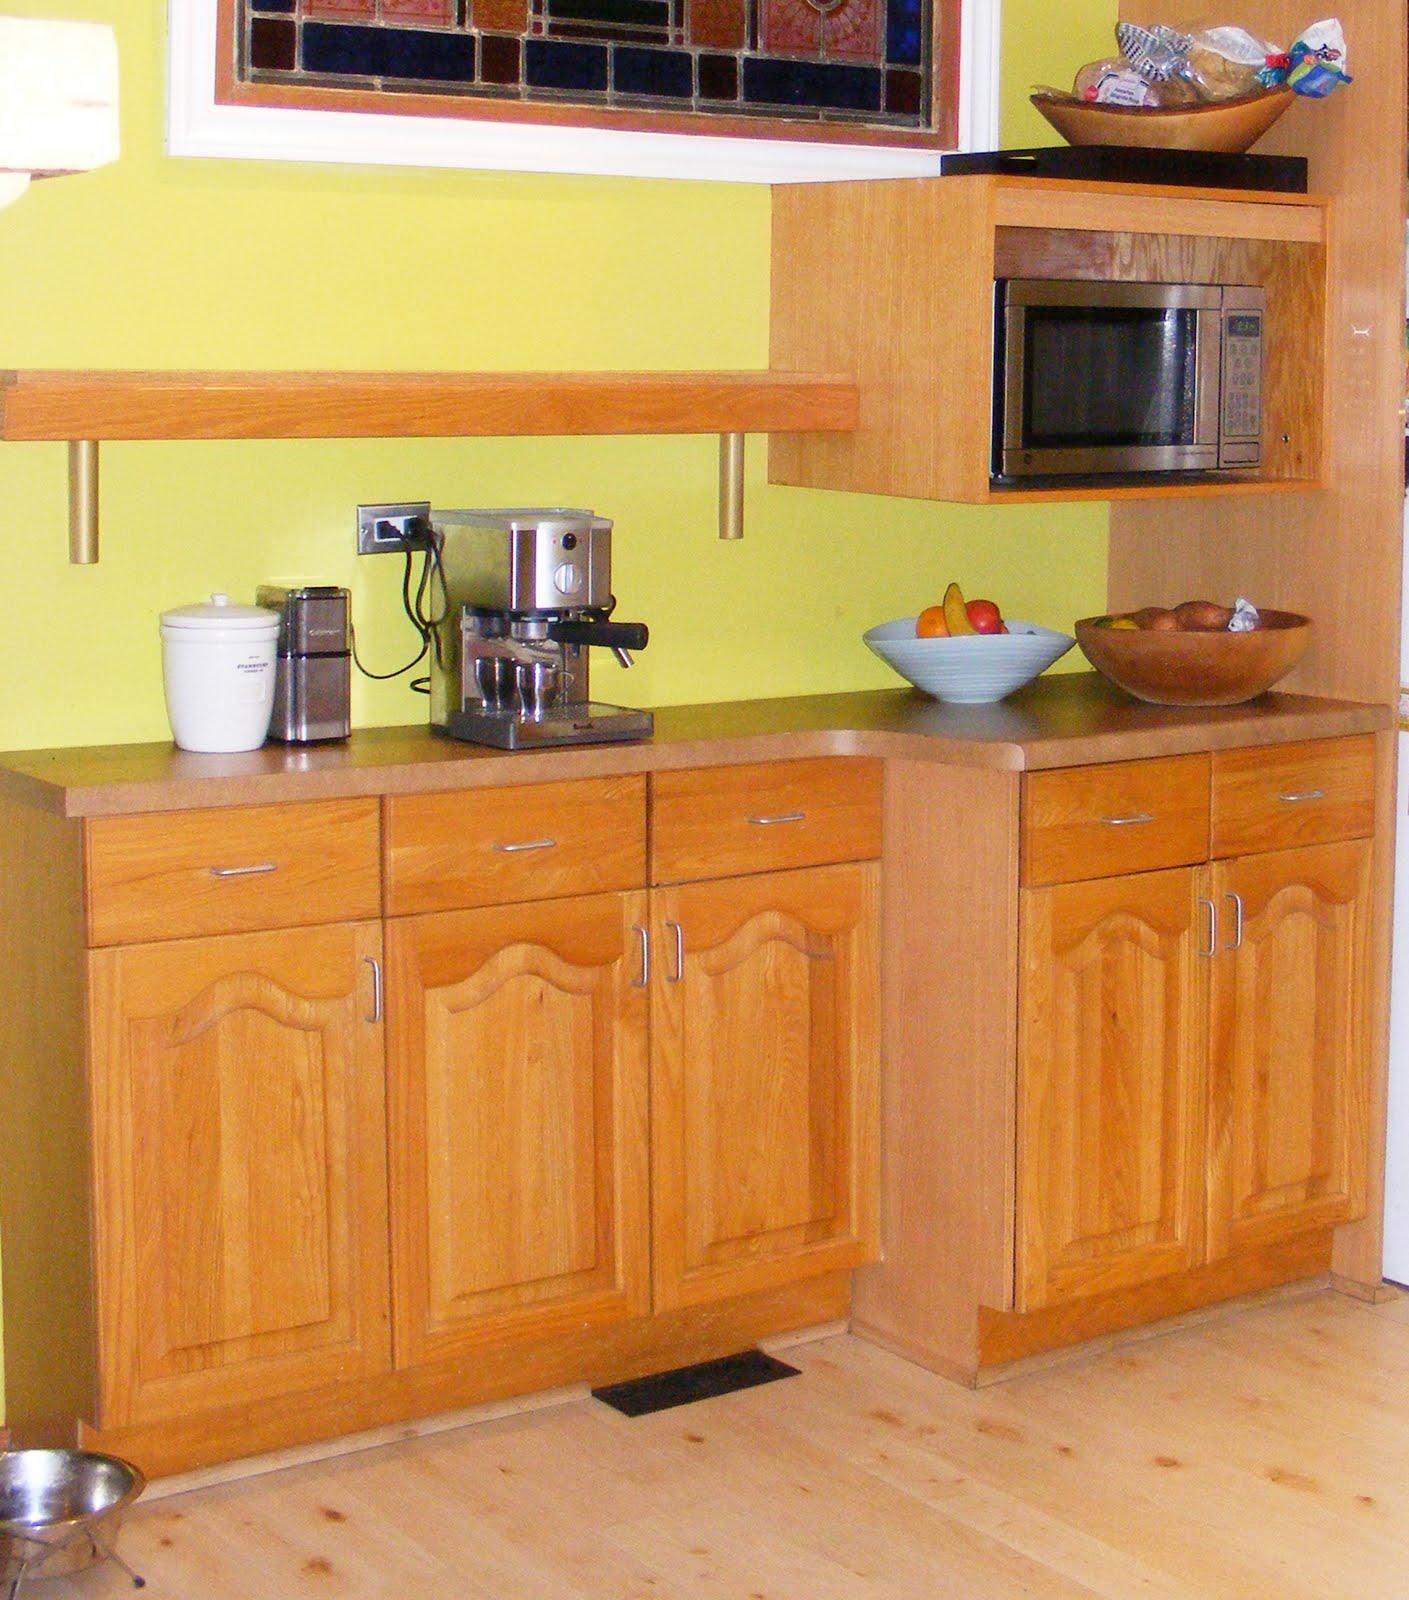 Jenna Rose Journal Kitchen Renovation Diy Stainless Steel Shelves